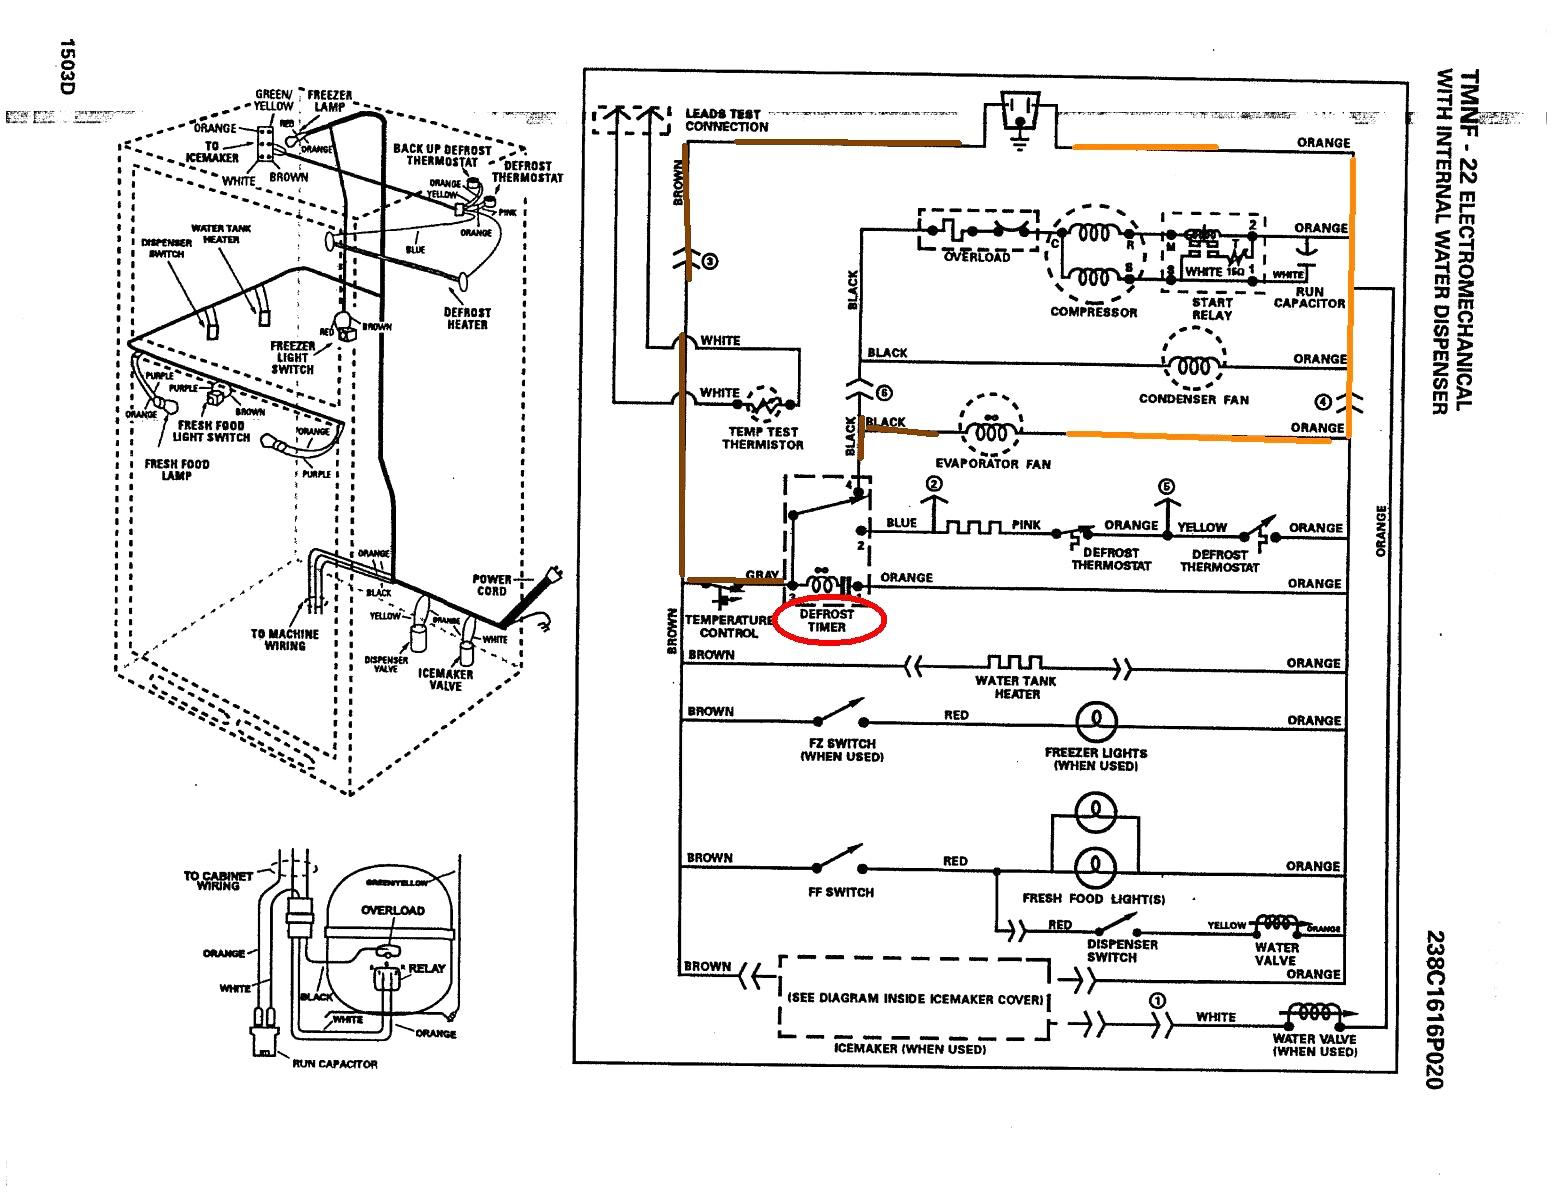 KY_3681] Rr3 Ge Relay Wiring Diagram Download DiagramXeira Hyedi Mohammedshrine Librar Wiring 101